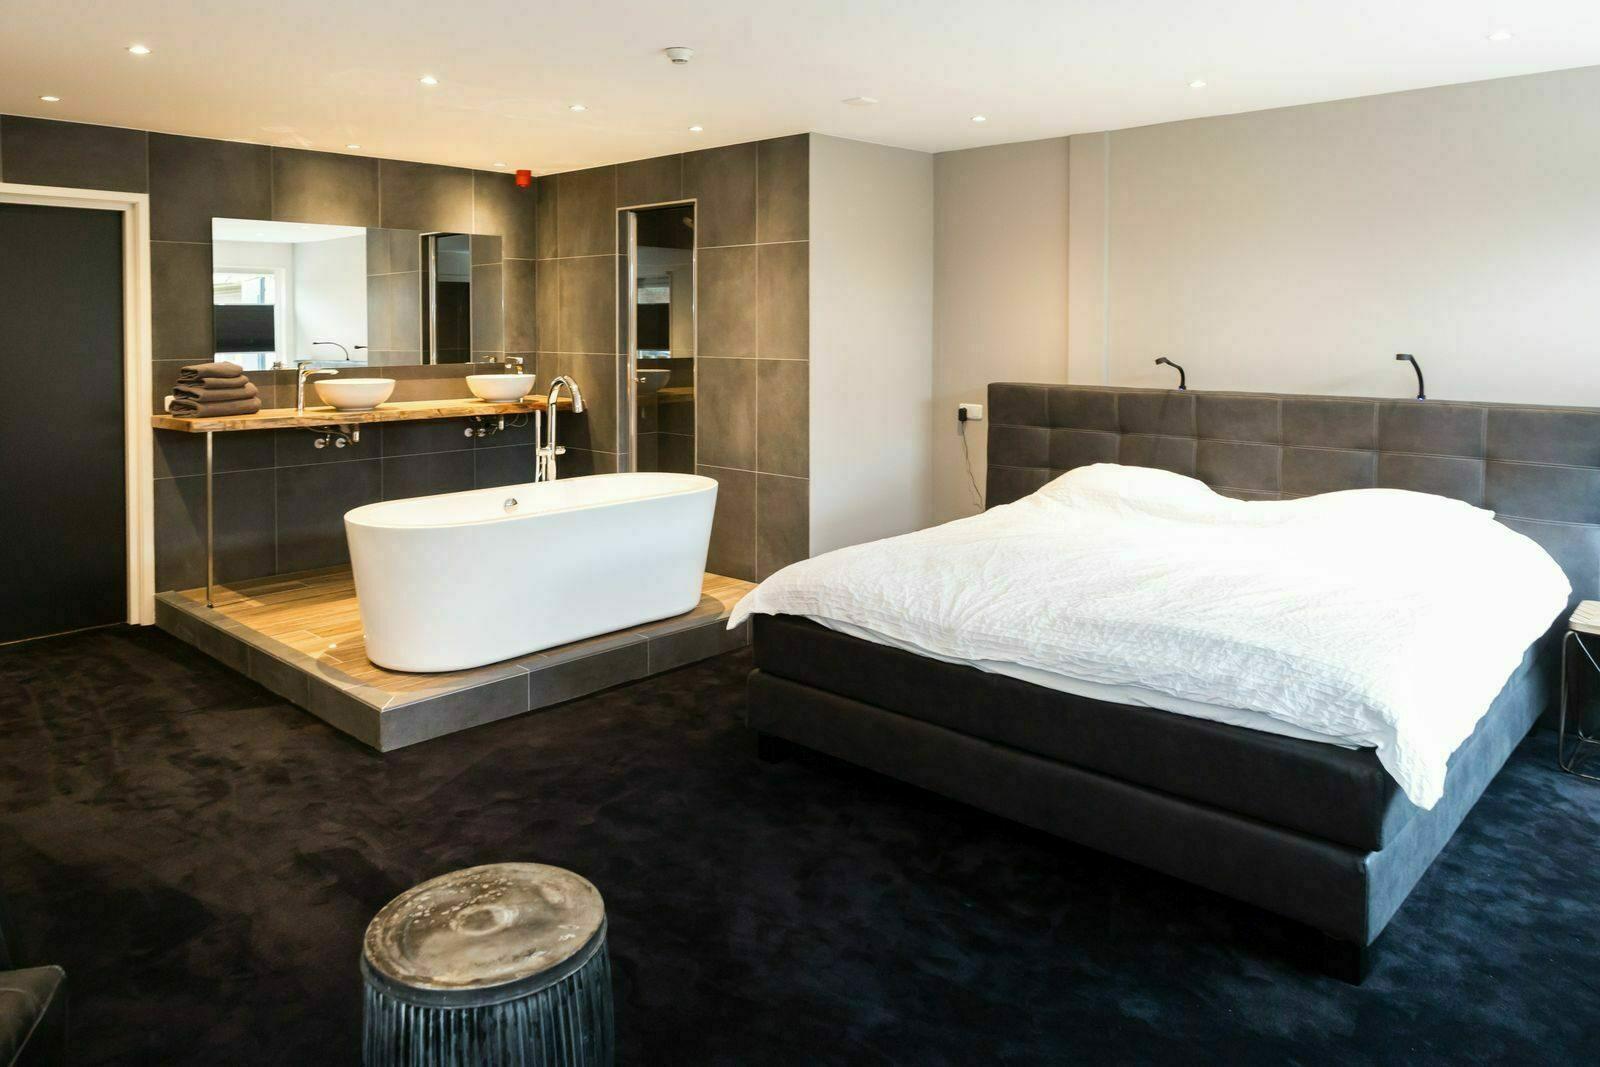 Slaapkamer met eigen sanitair